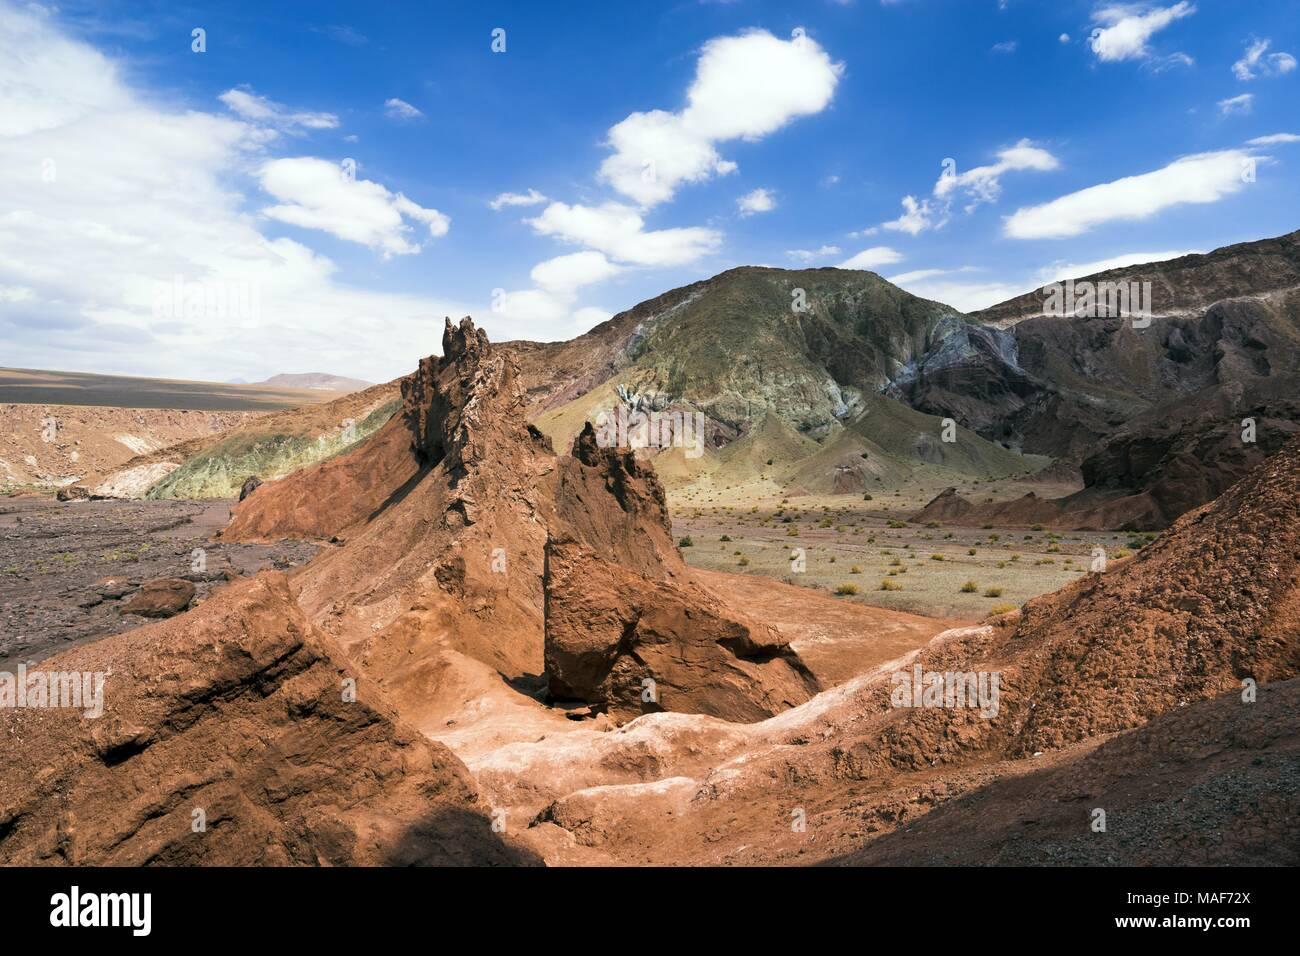 Valle de Arcoiris, Rainbow Valley,  Atacama, Chile - Stock Image